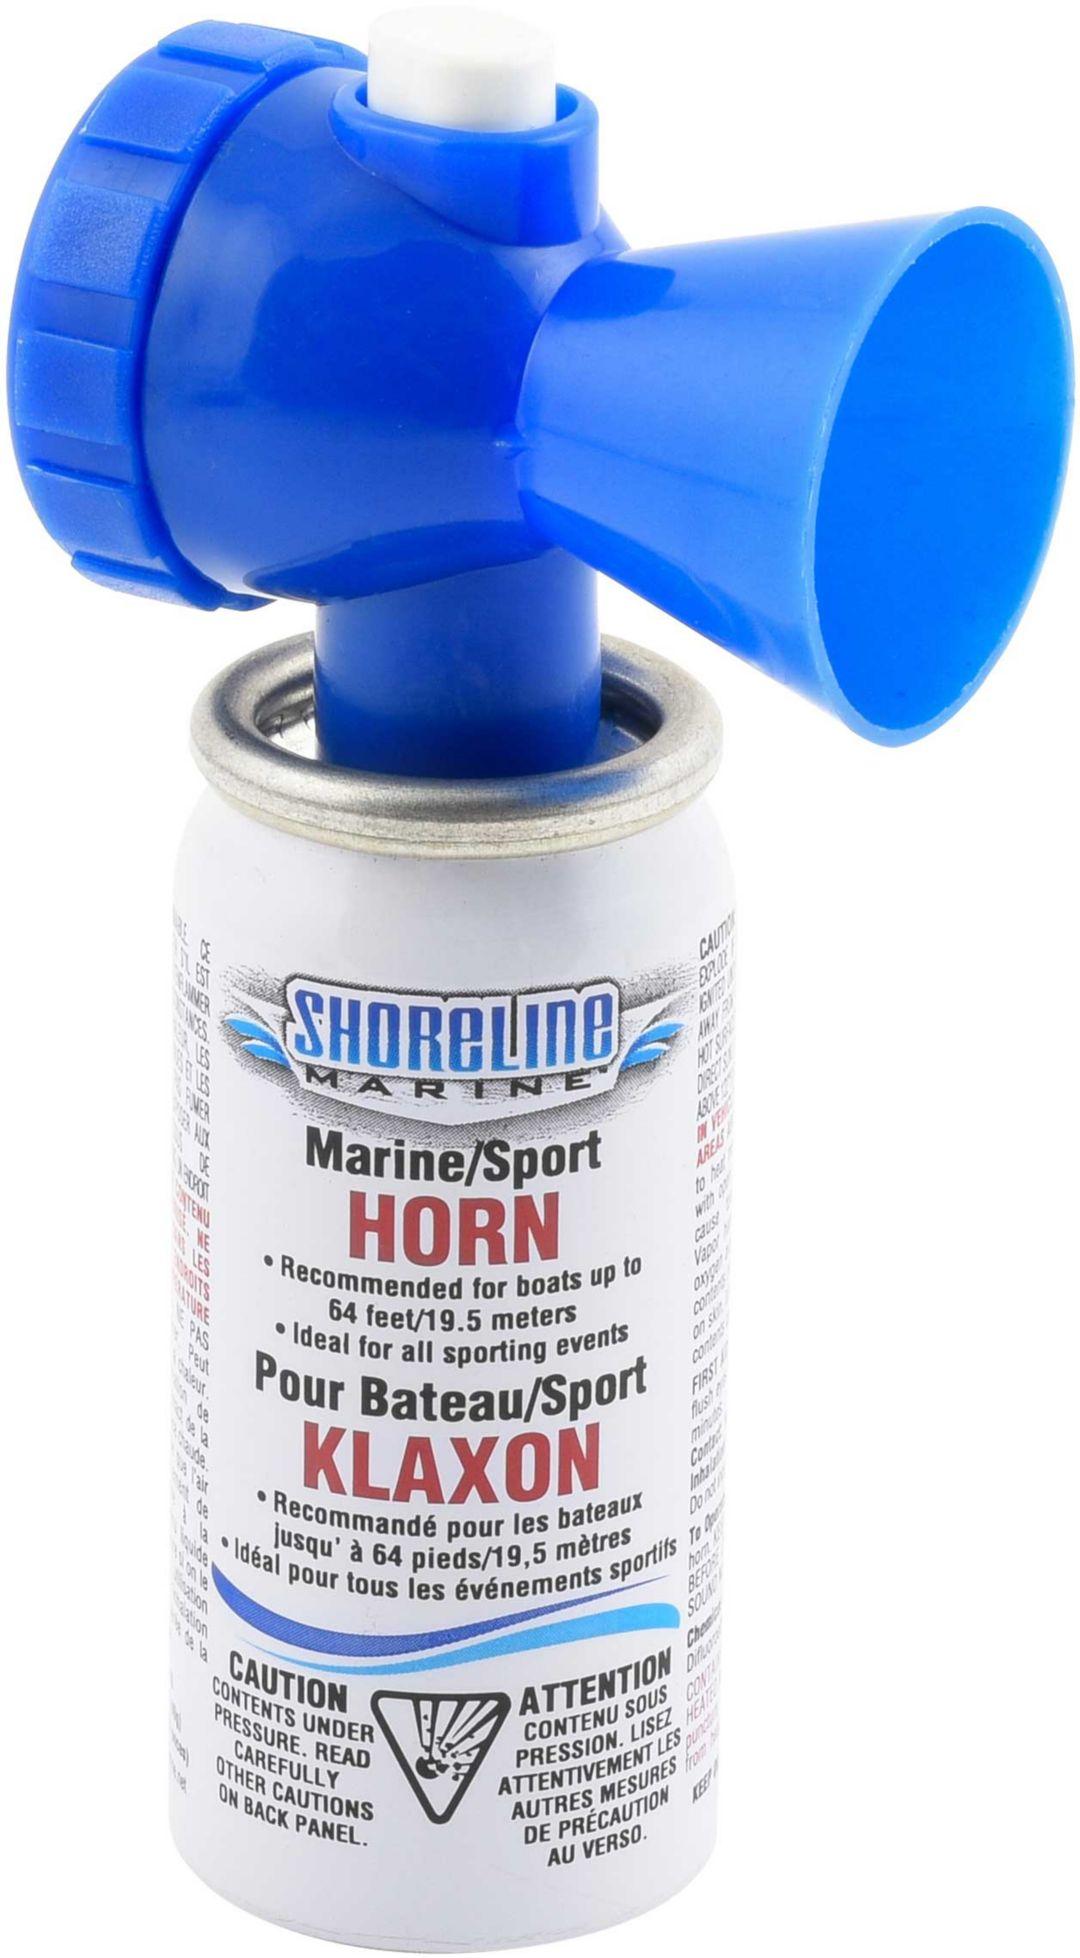 6926dfb39 Shoreline Marine/Sport Air Horn | DICK'S Sporting Goods